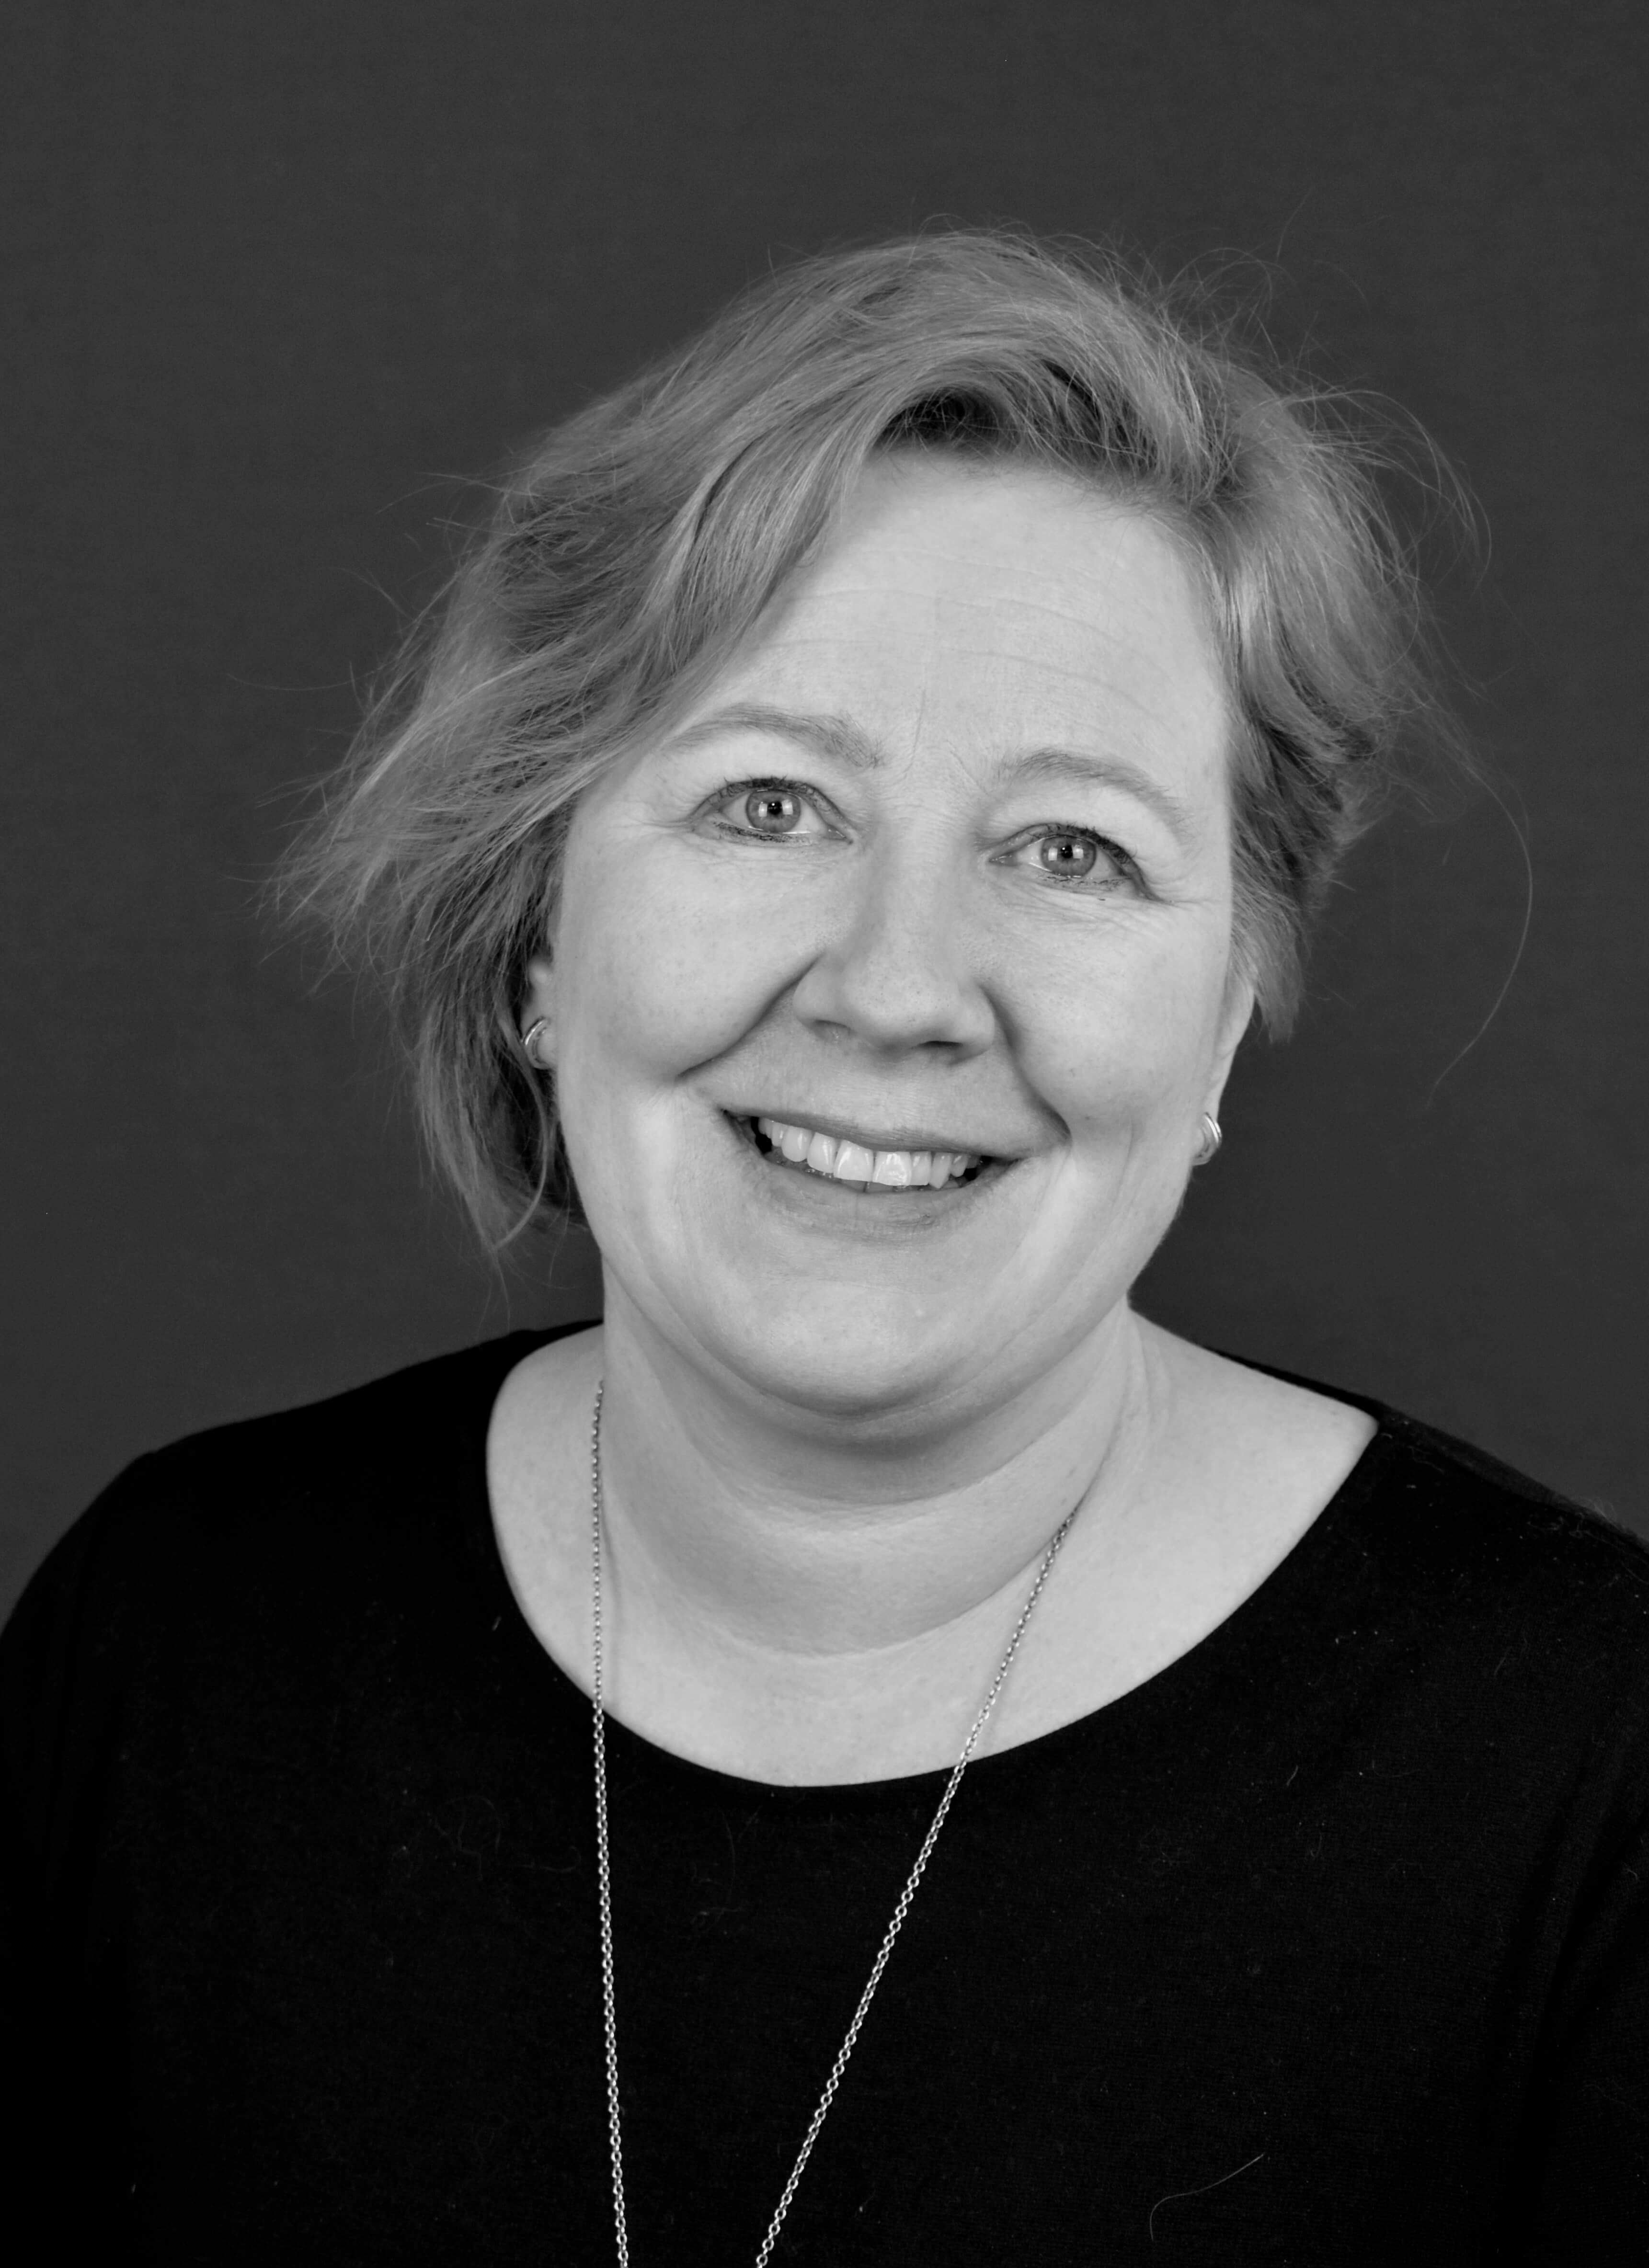 Heidi Kinnunen, co-founder of Finnwards Oy